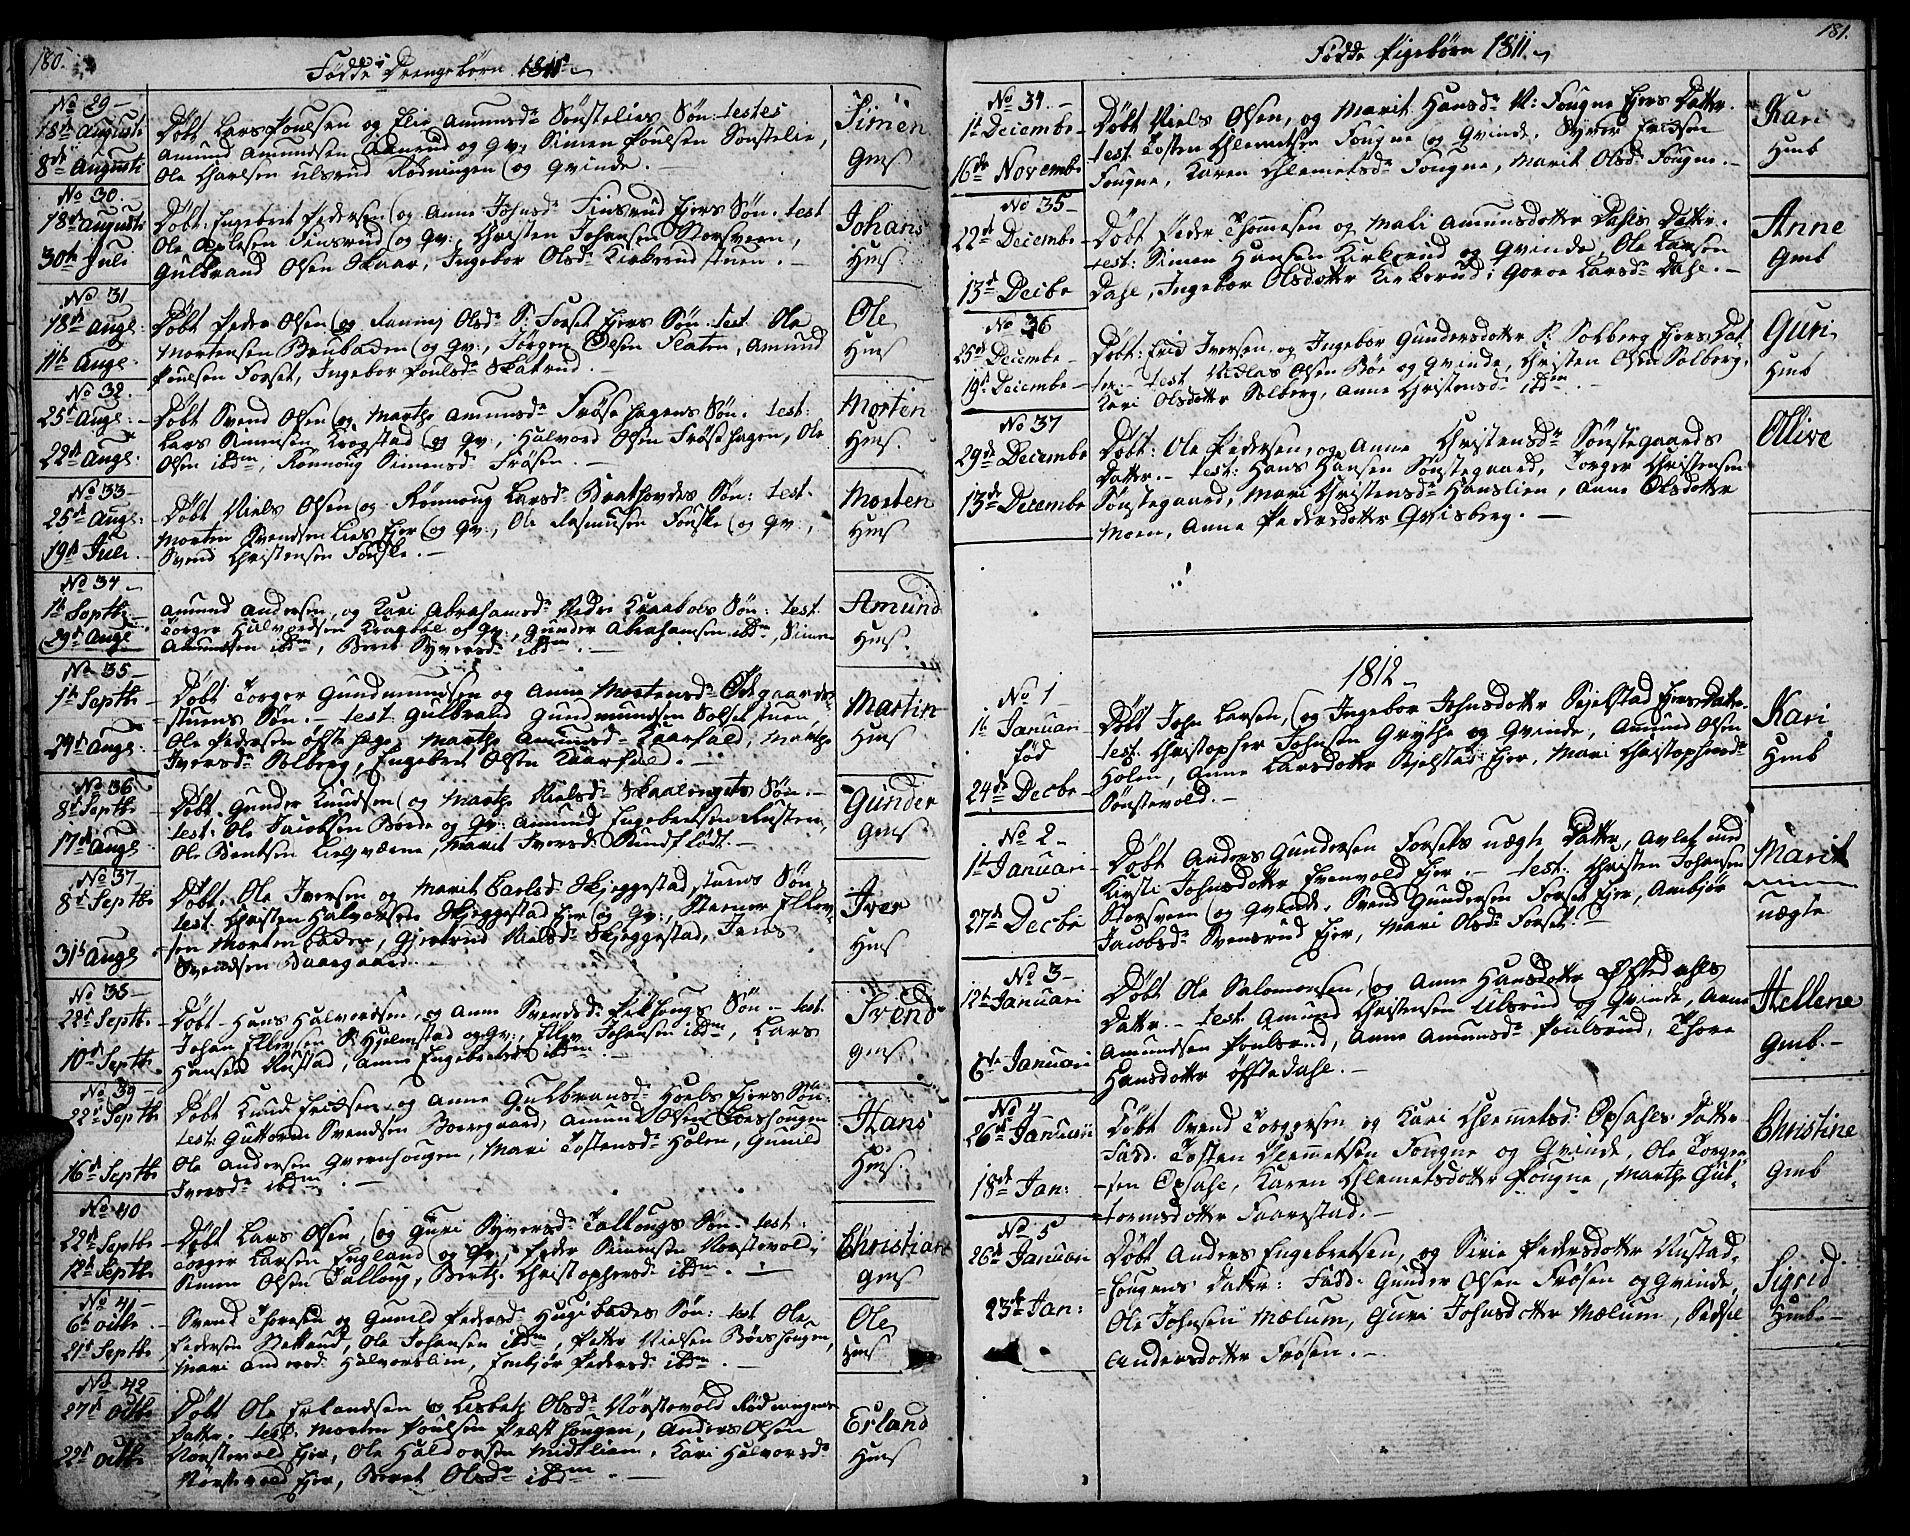 SAH, Gausdal prestekontor, Ministerialbok nr. 4, 1809-1817, s. 180-181